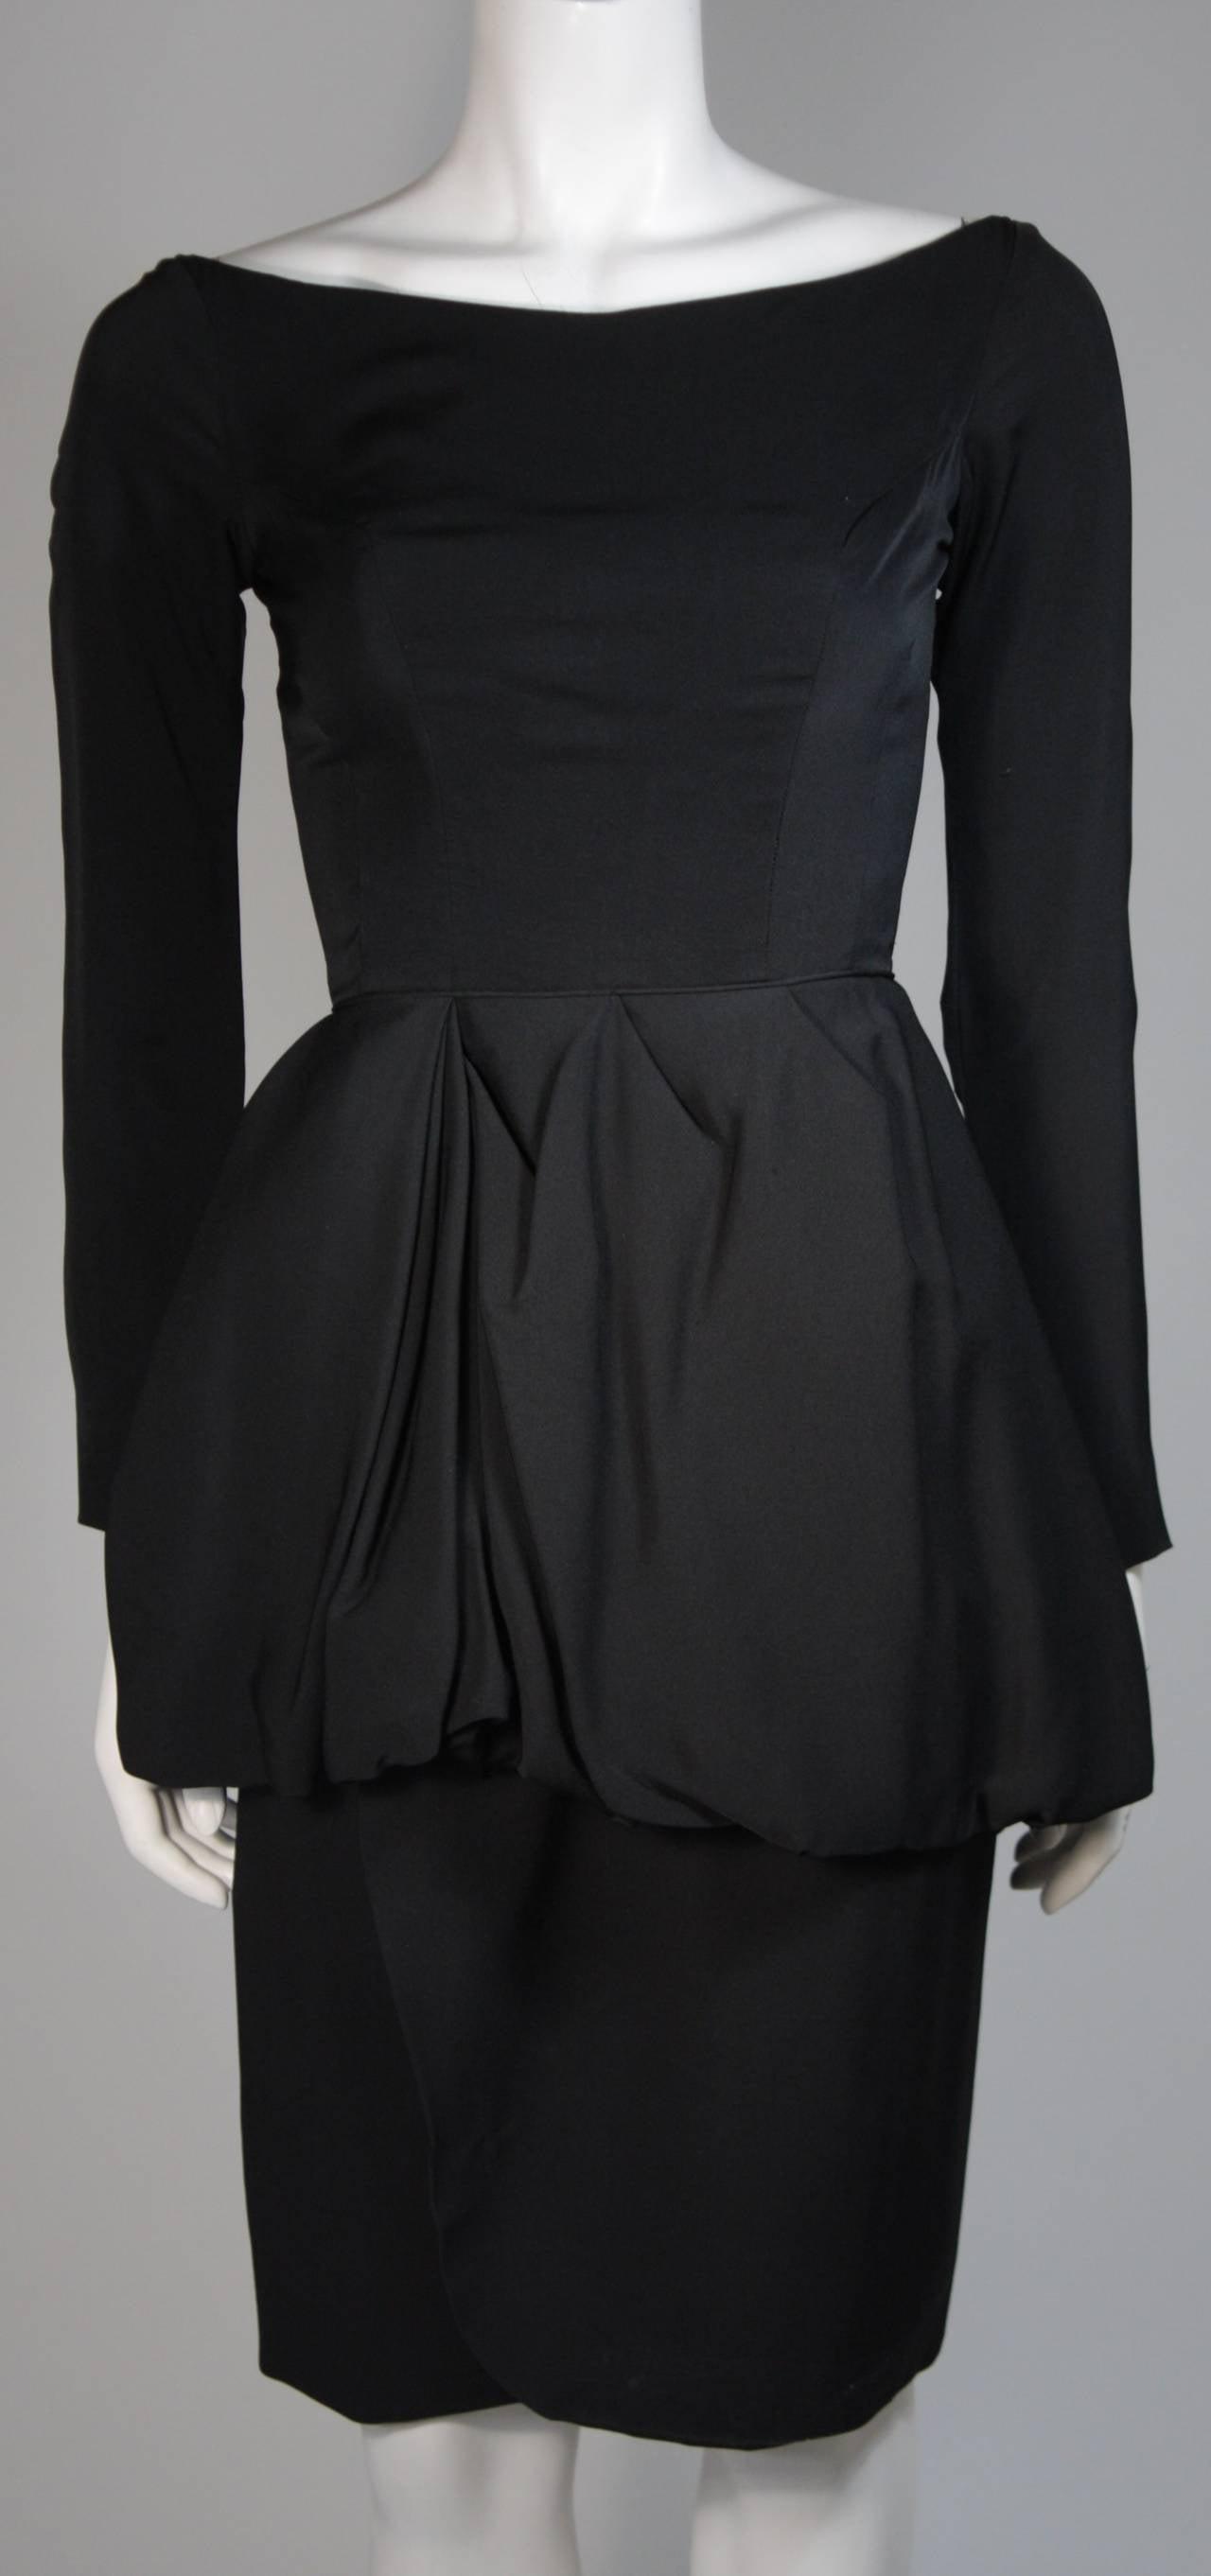 Ceil Chapman Black Draped Princess Seam Peplum Style Waist Dress Size XS 3